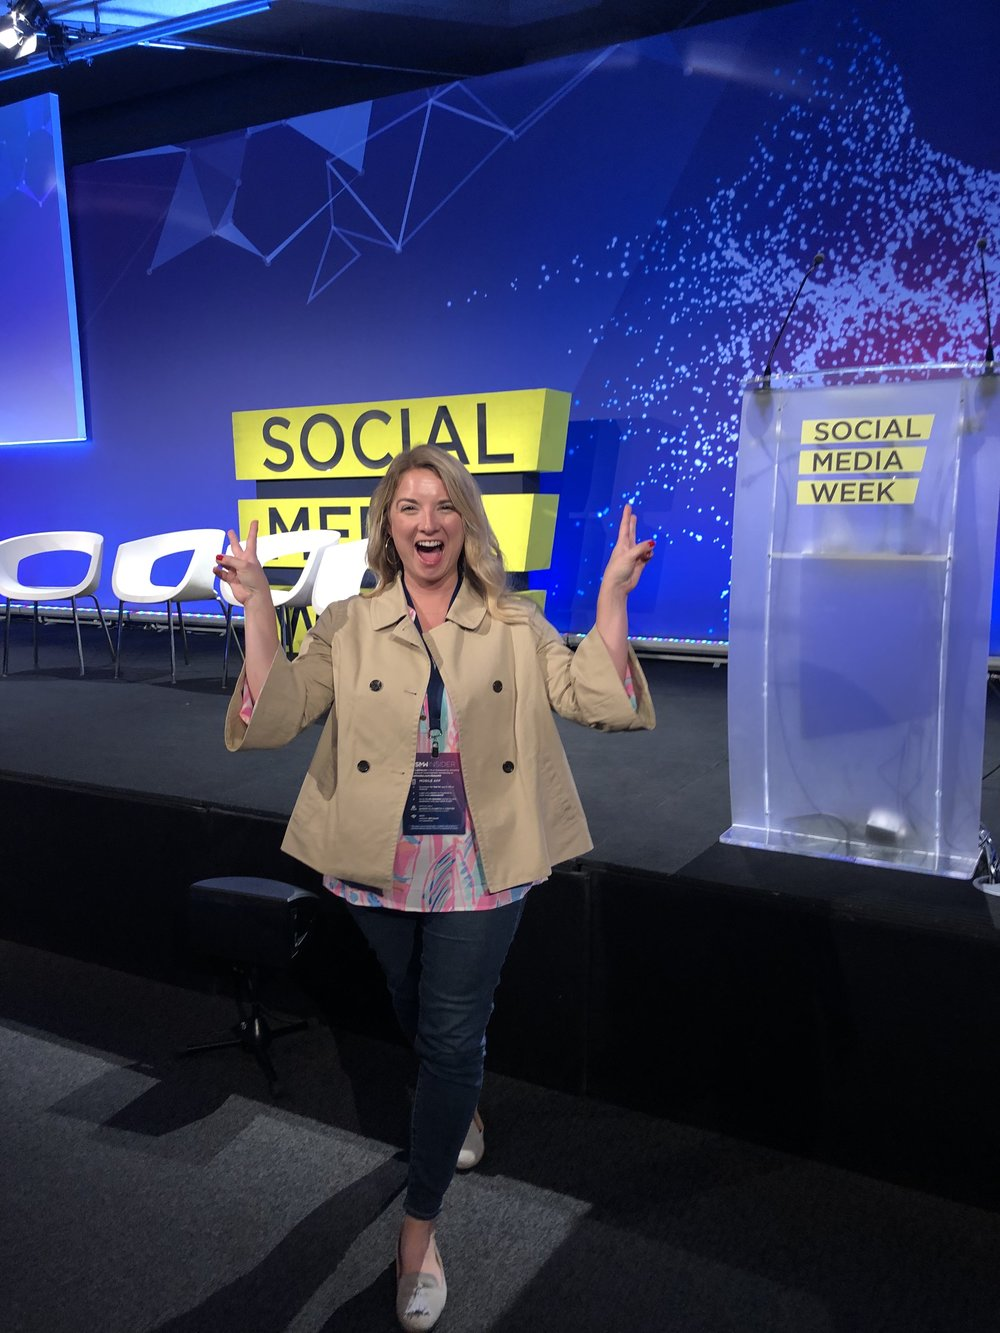 SocialMediaWeek_Wrap_PinckneyPalm